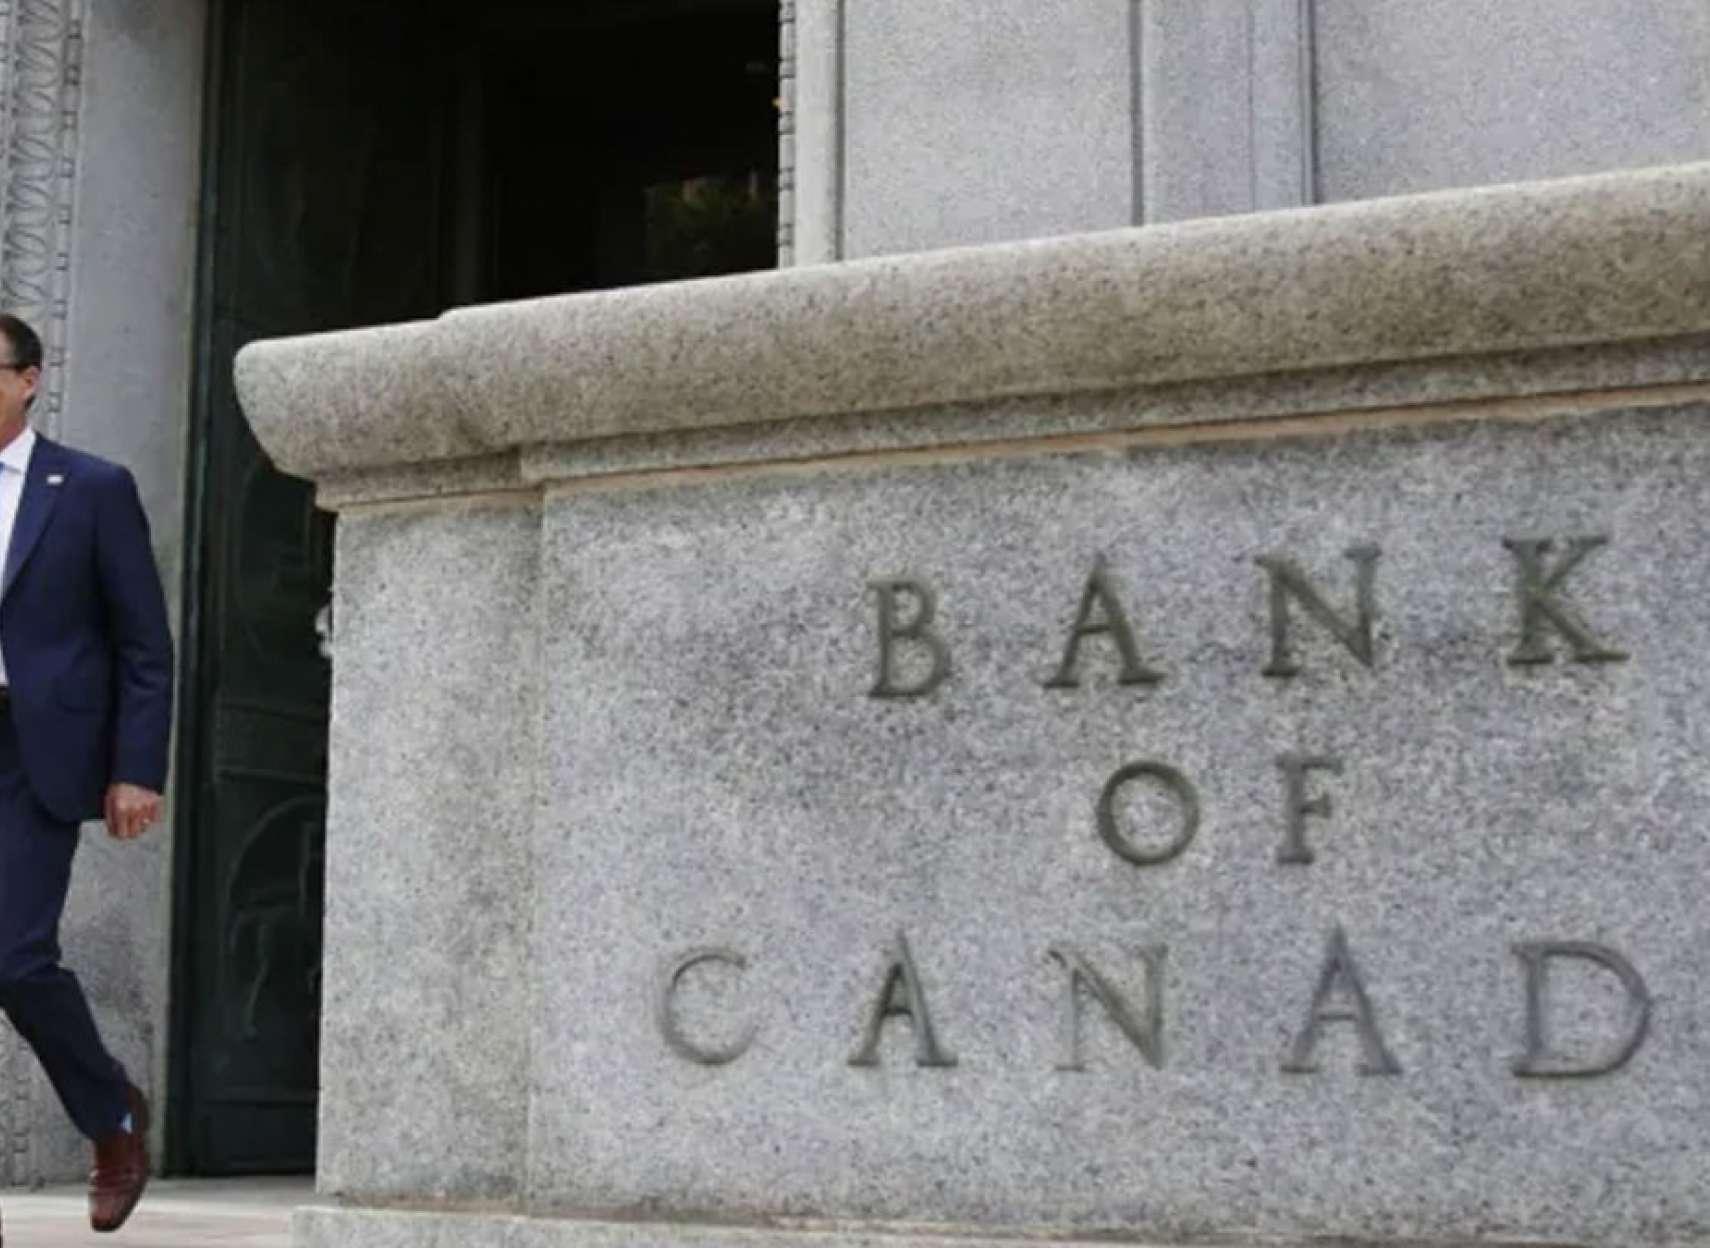 اخبار-کانادا-اعلان-تصمیم-نرخ-بهره-بانکی-کانادا-بر-اساس-کرونا-و-زمان-تولید-واکسن